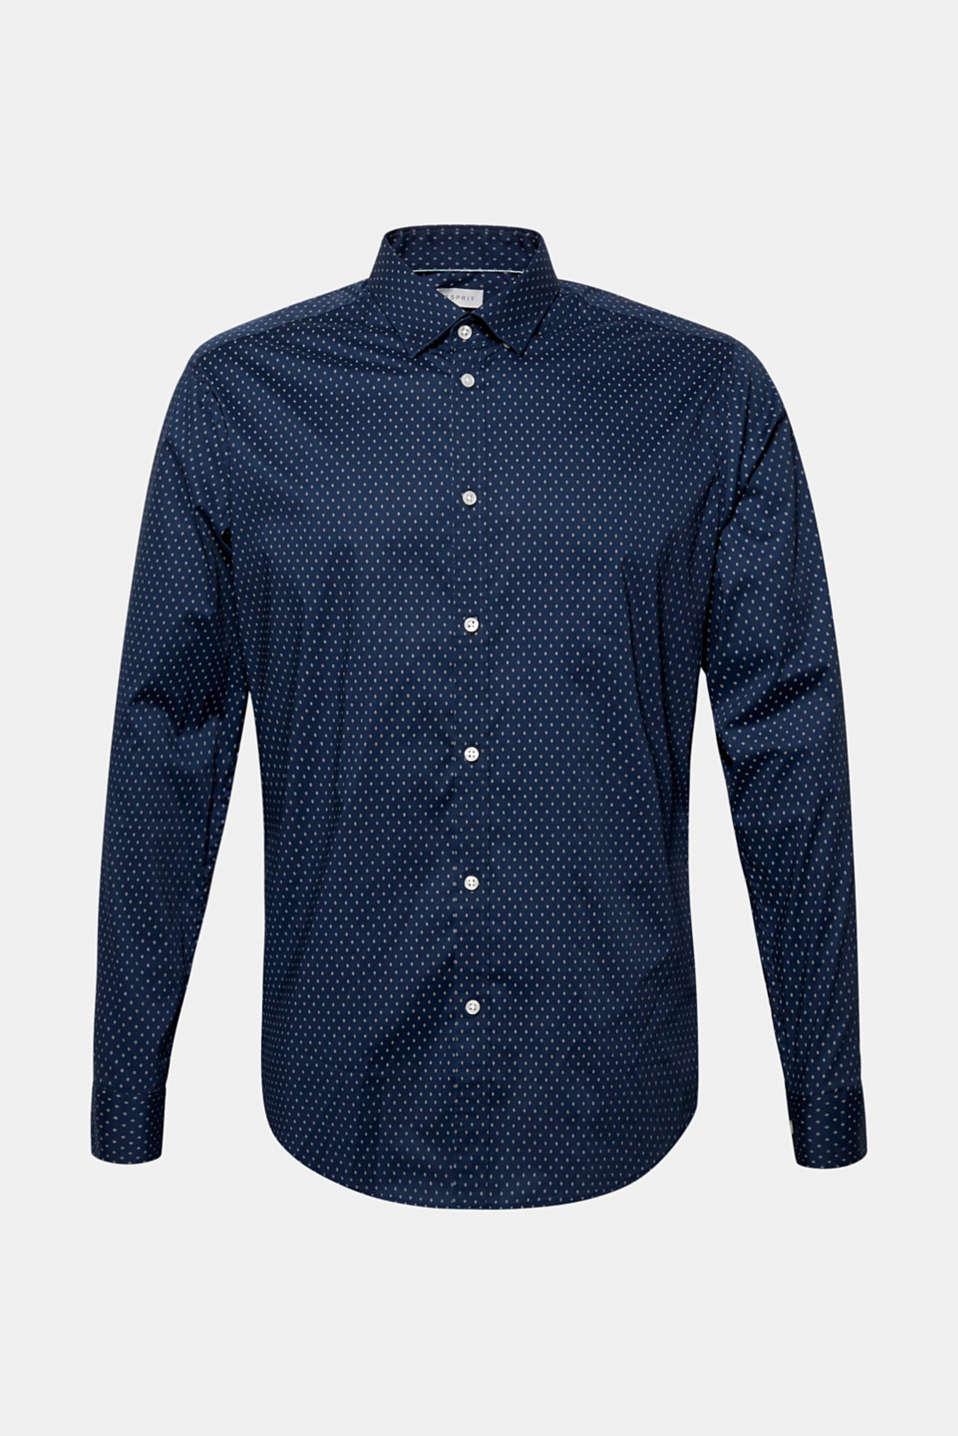 Shirts woven Slim fit, DARK BLUE, detail image number 6